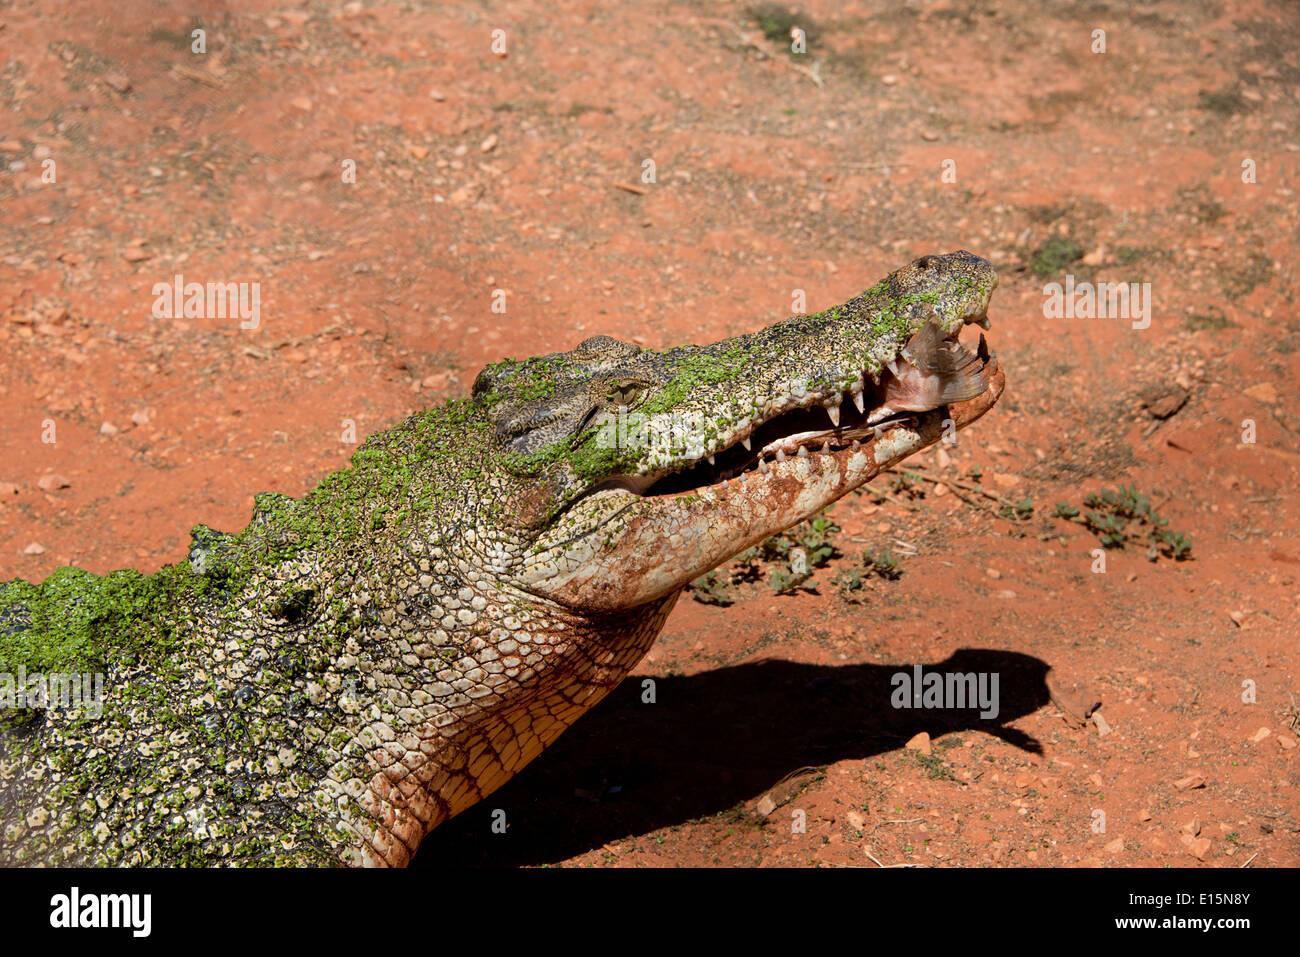 Australia, Western Australia, Broome. Malcolm Douglas Crocodile Park. Saltwater crocodile (Captive: Crocodylus porosus). - Stock Image